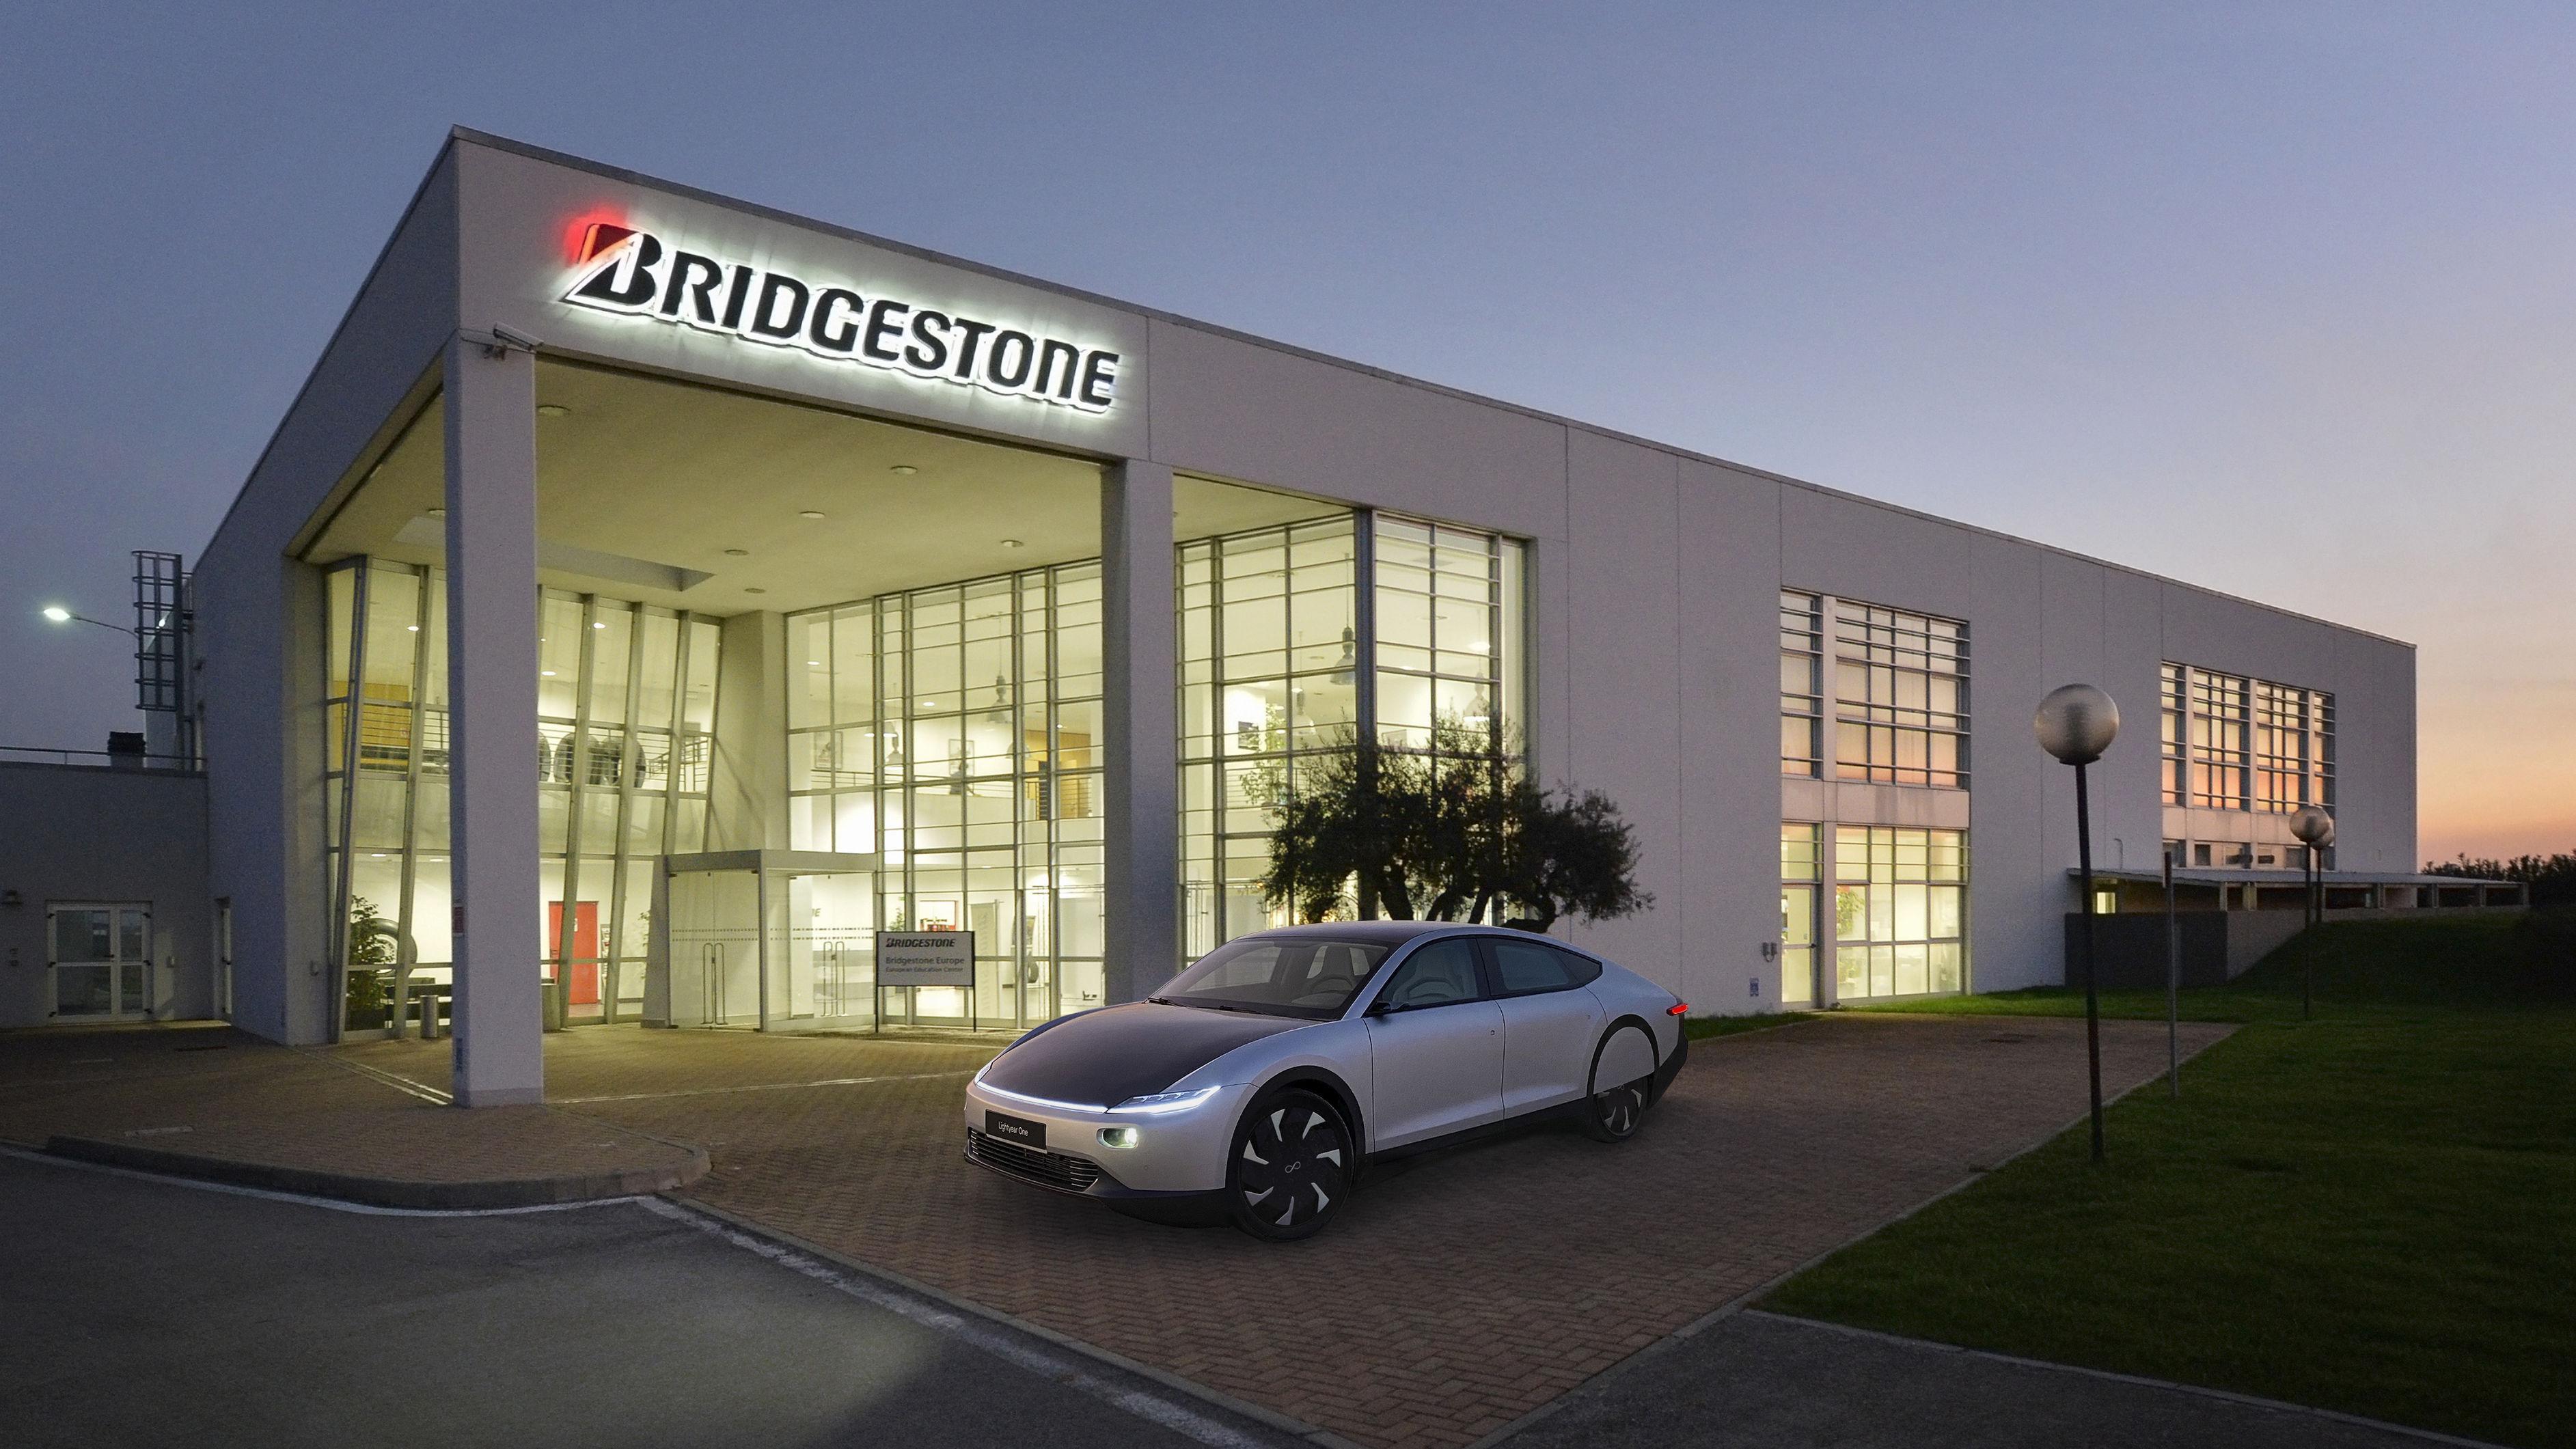 Lightyear and Bridgestone partnership-main_i.jpg